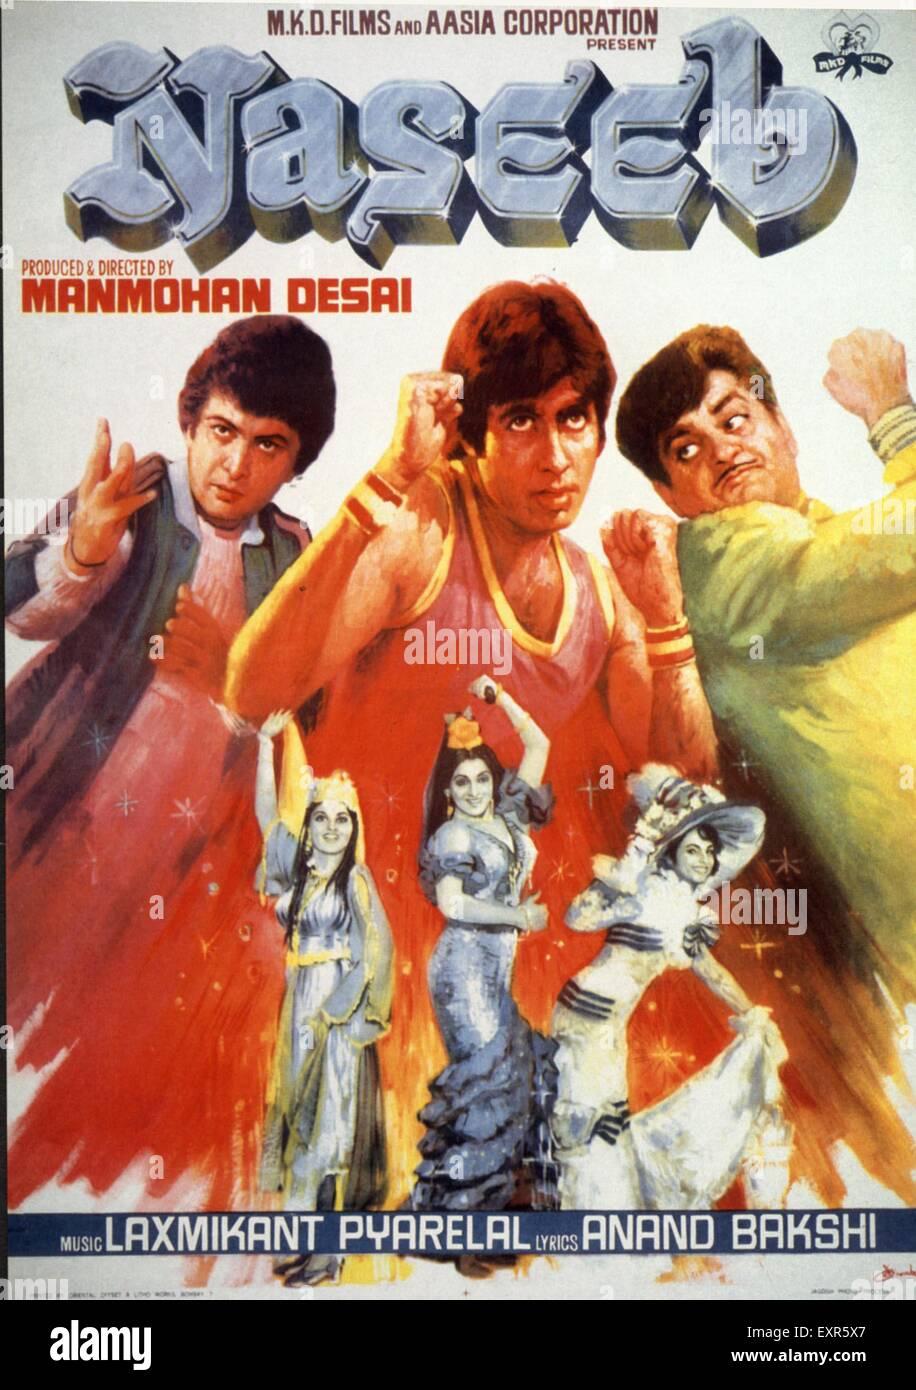 1980er Jahren Indien Naseeb Filmplakat Stockbild